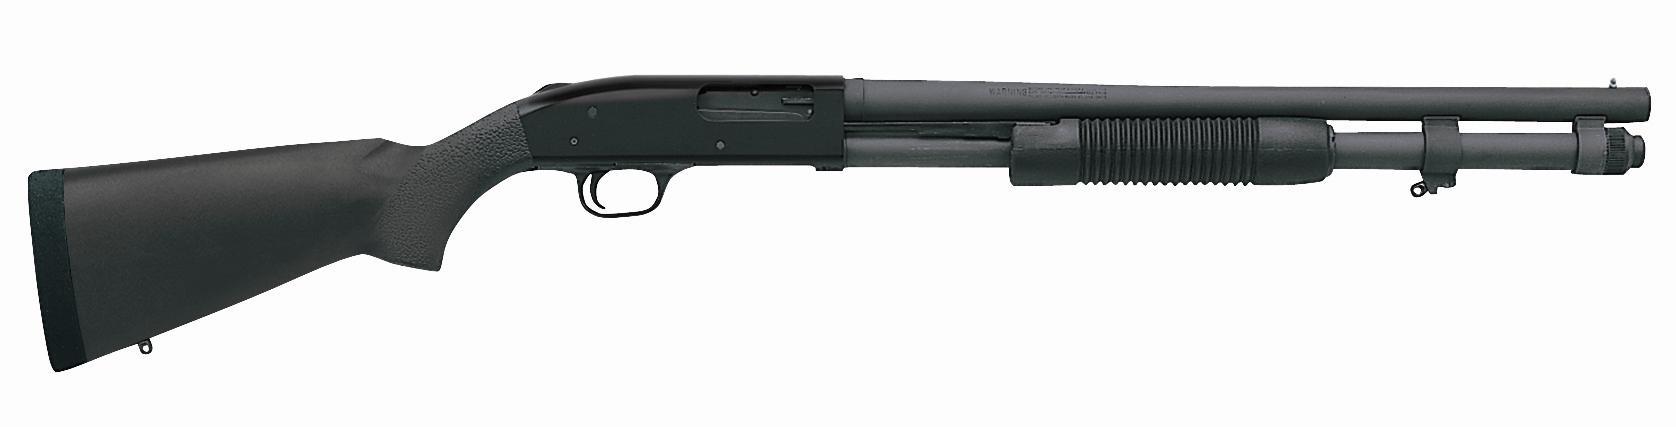 Shotgun for Girlfriend?-51660.jpg